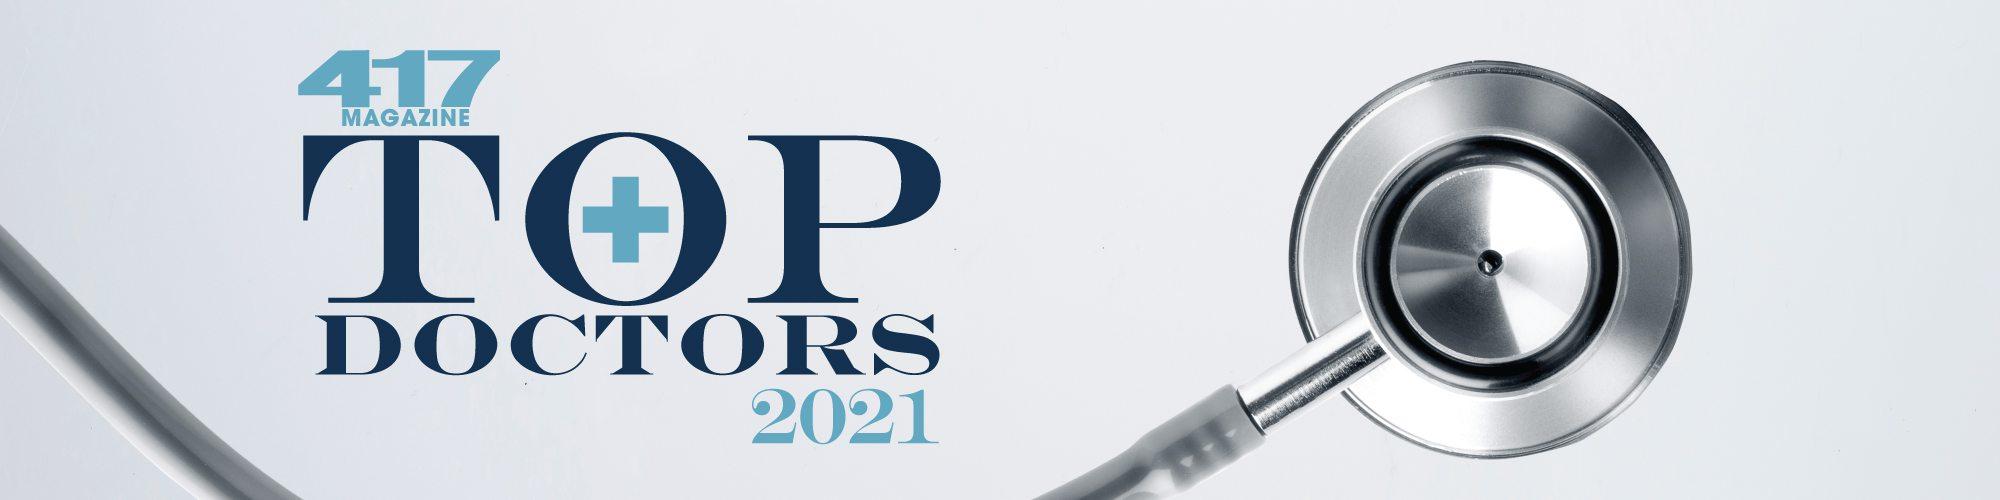 Top Doctors 2021 Nominations